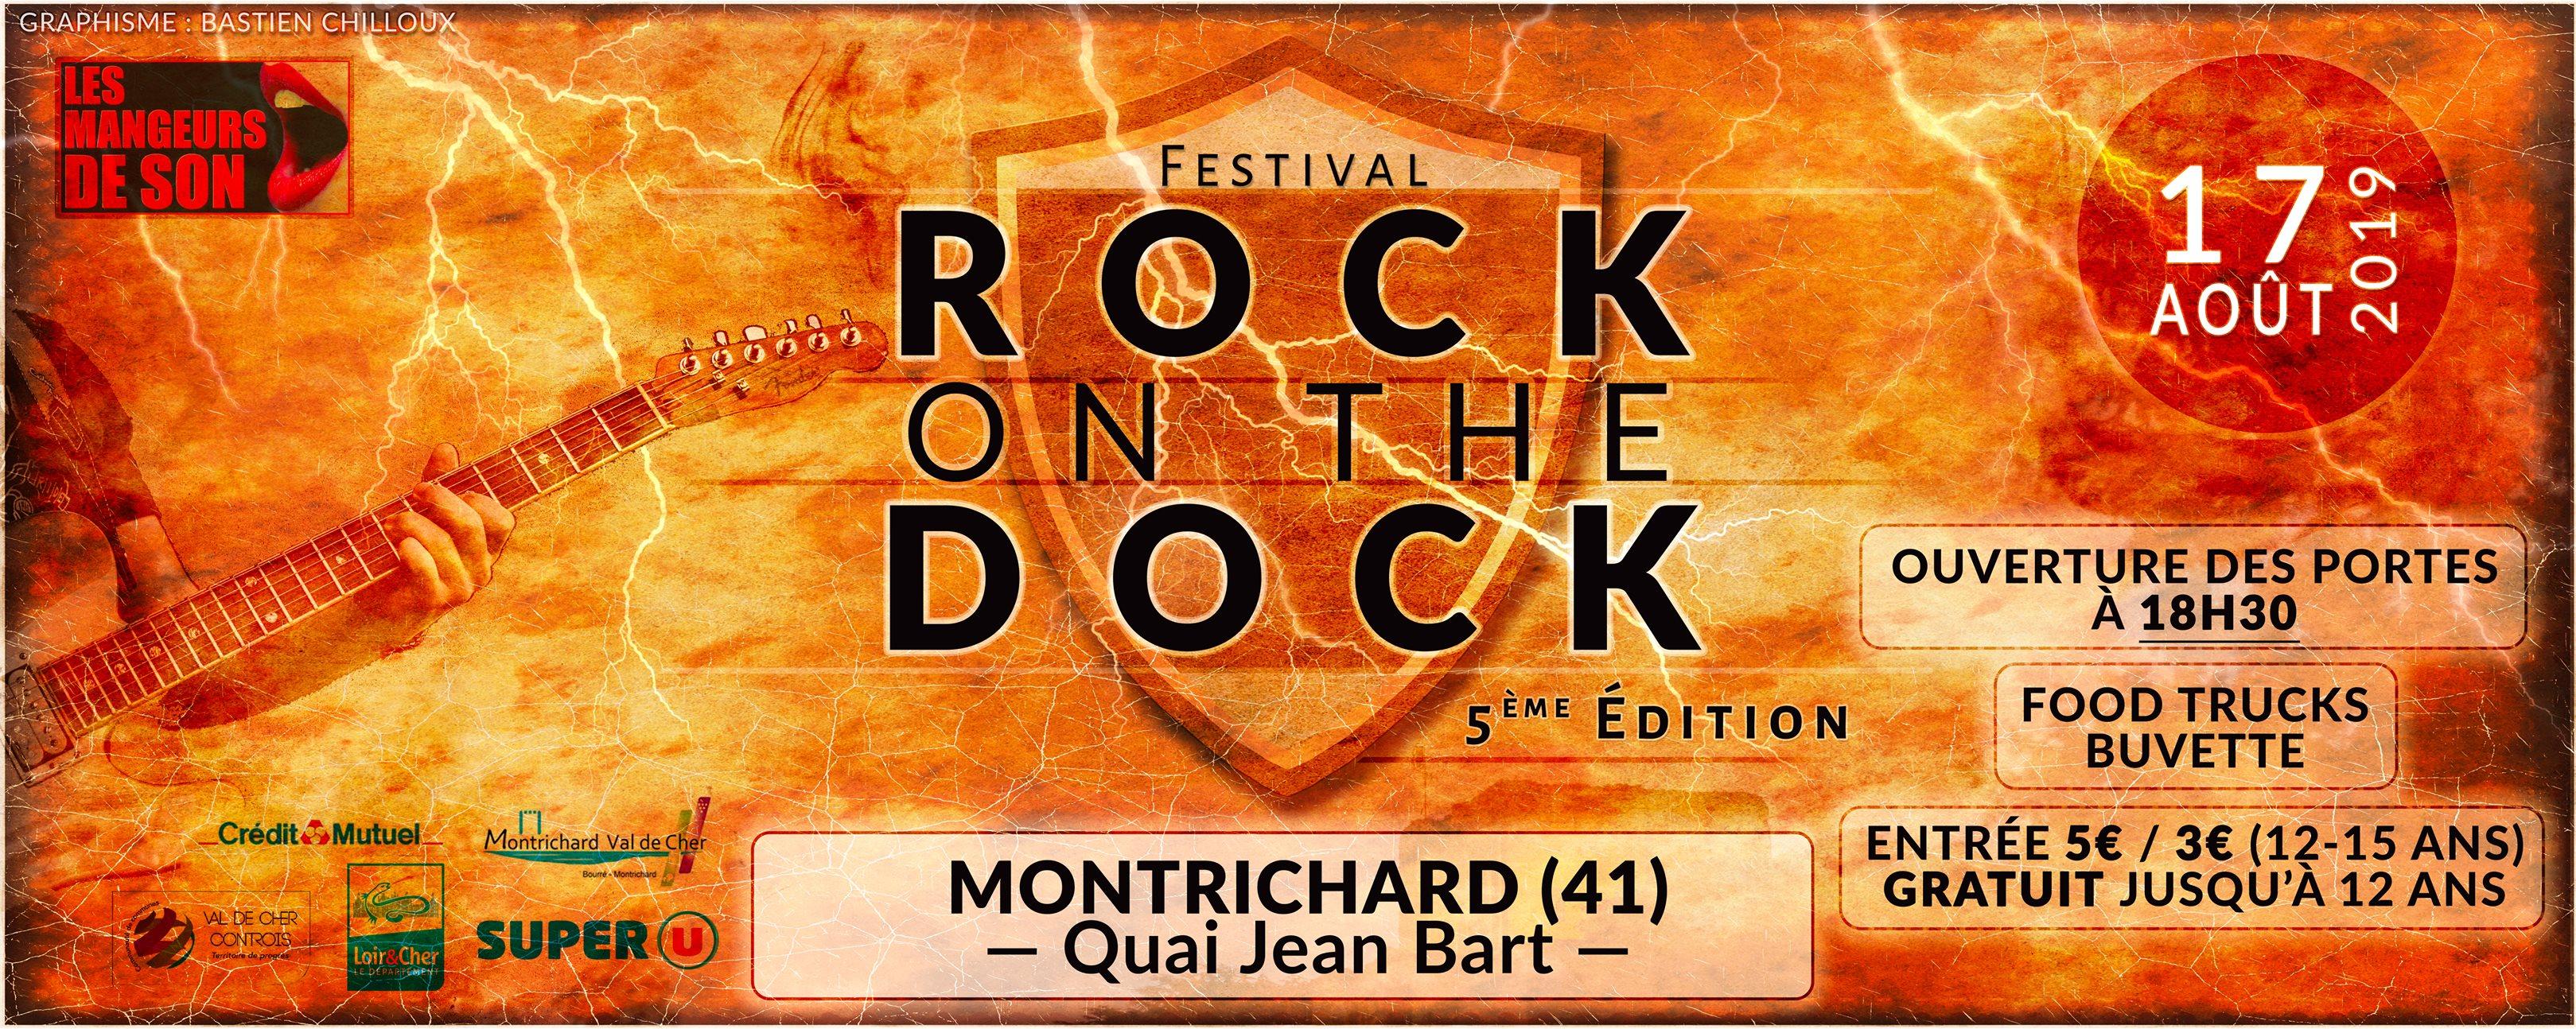 Rock on the dock Montrichard 2019